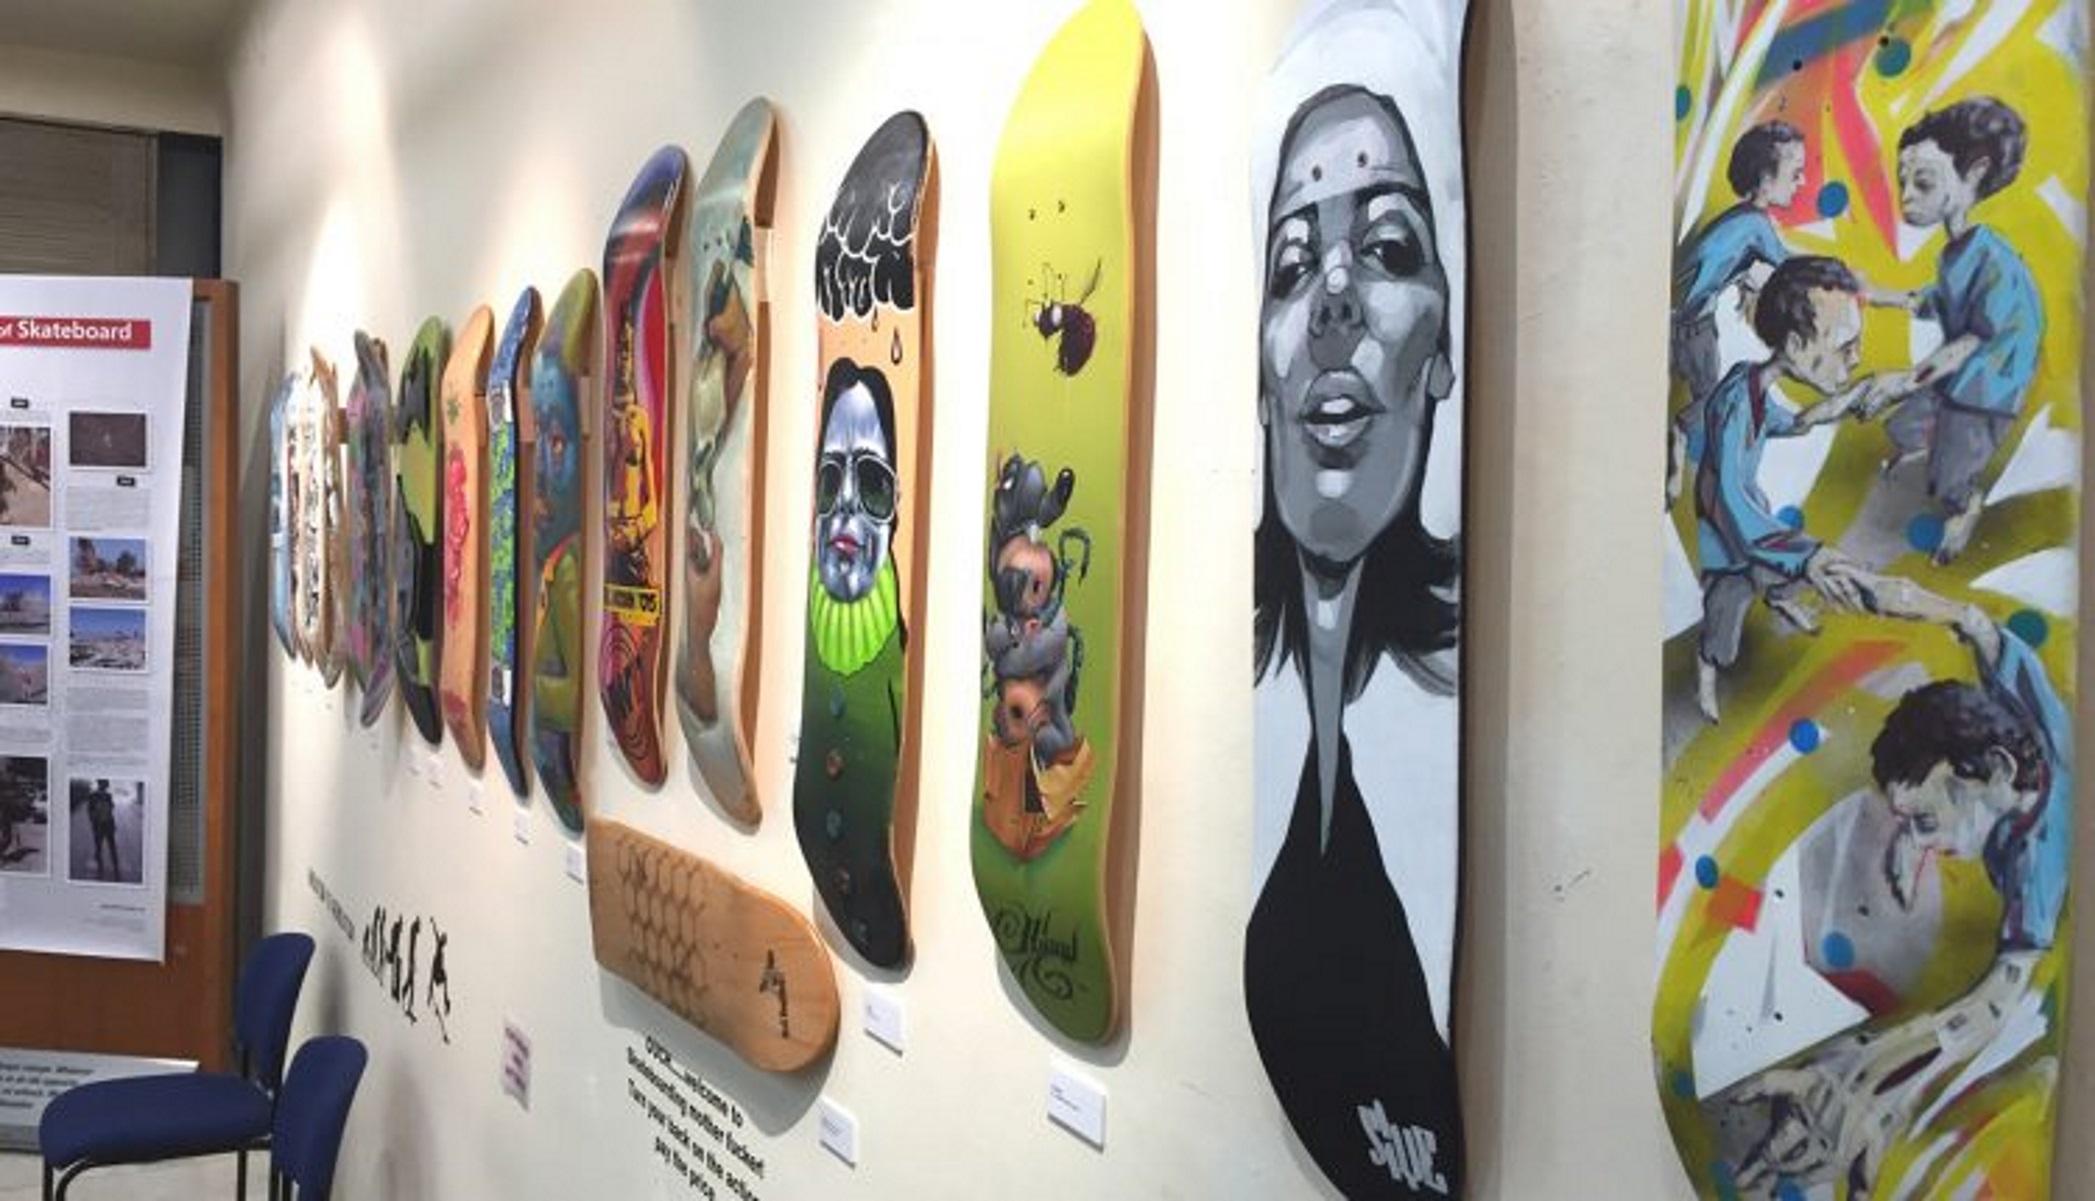 «Skateboard Art Crimes»: Ο Έλληνας που έκανε τα skateboards μοναδικά έργα τέχνης (pics, vid)